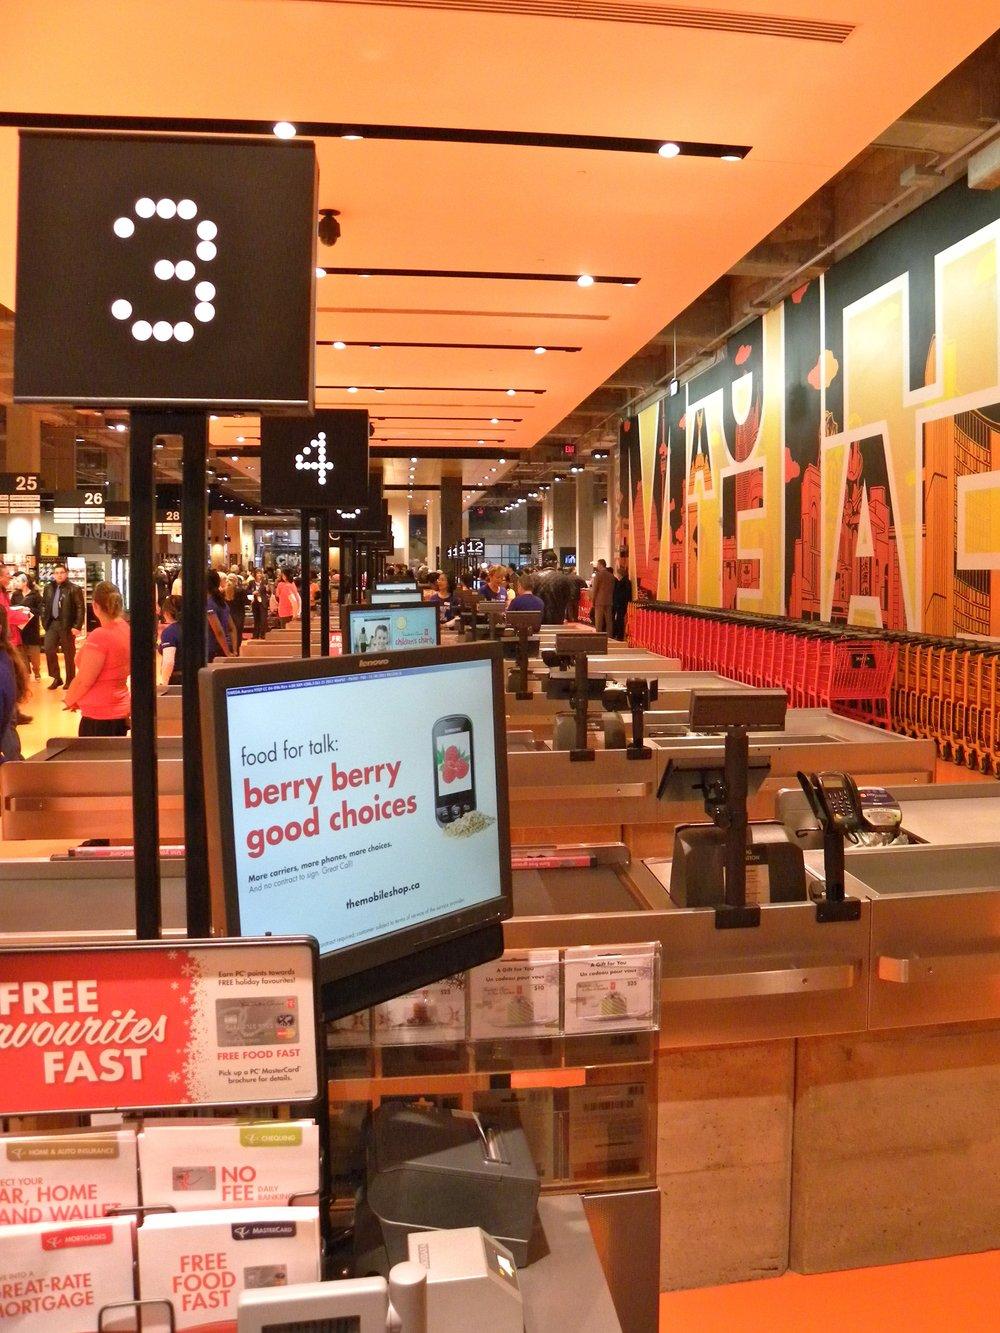 Self-service checkout (Photo credit: Jason Paris)